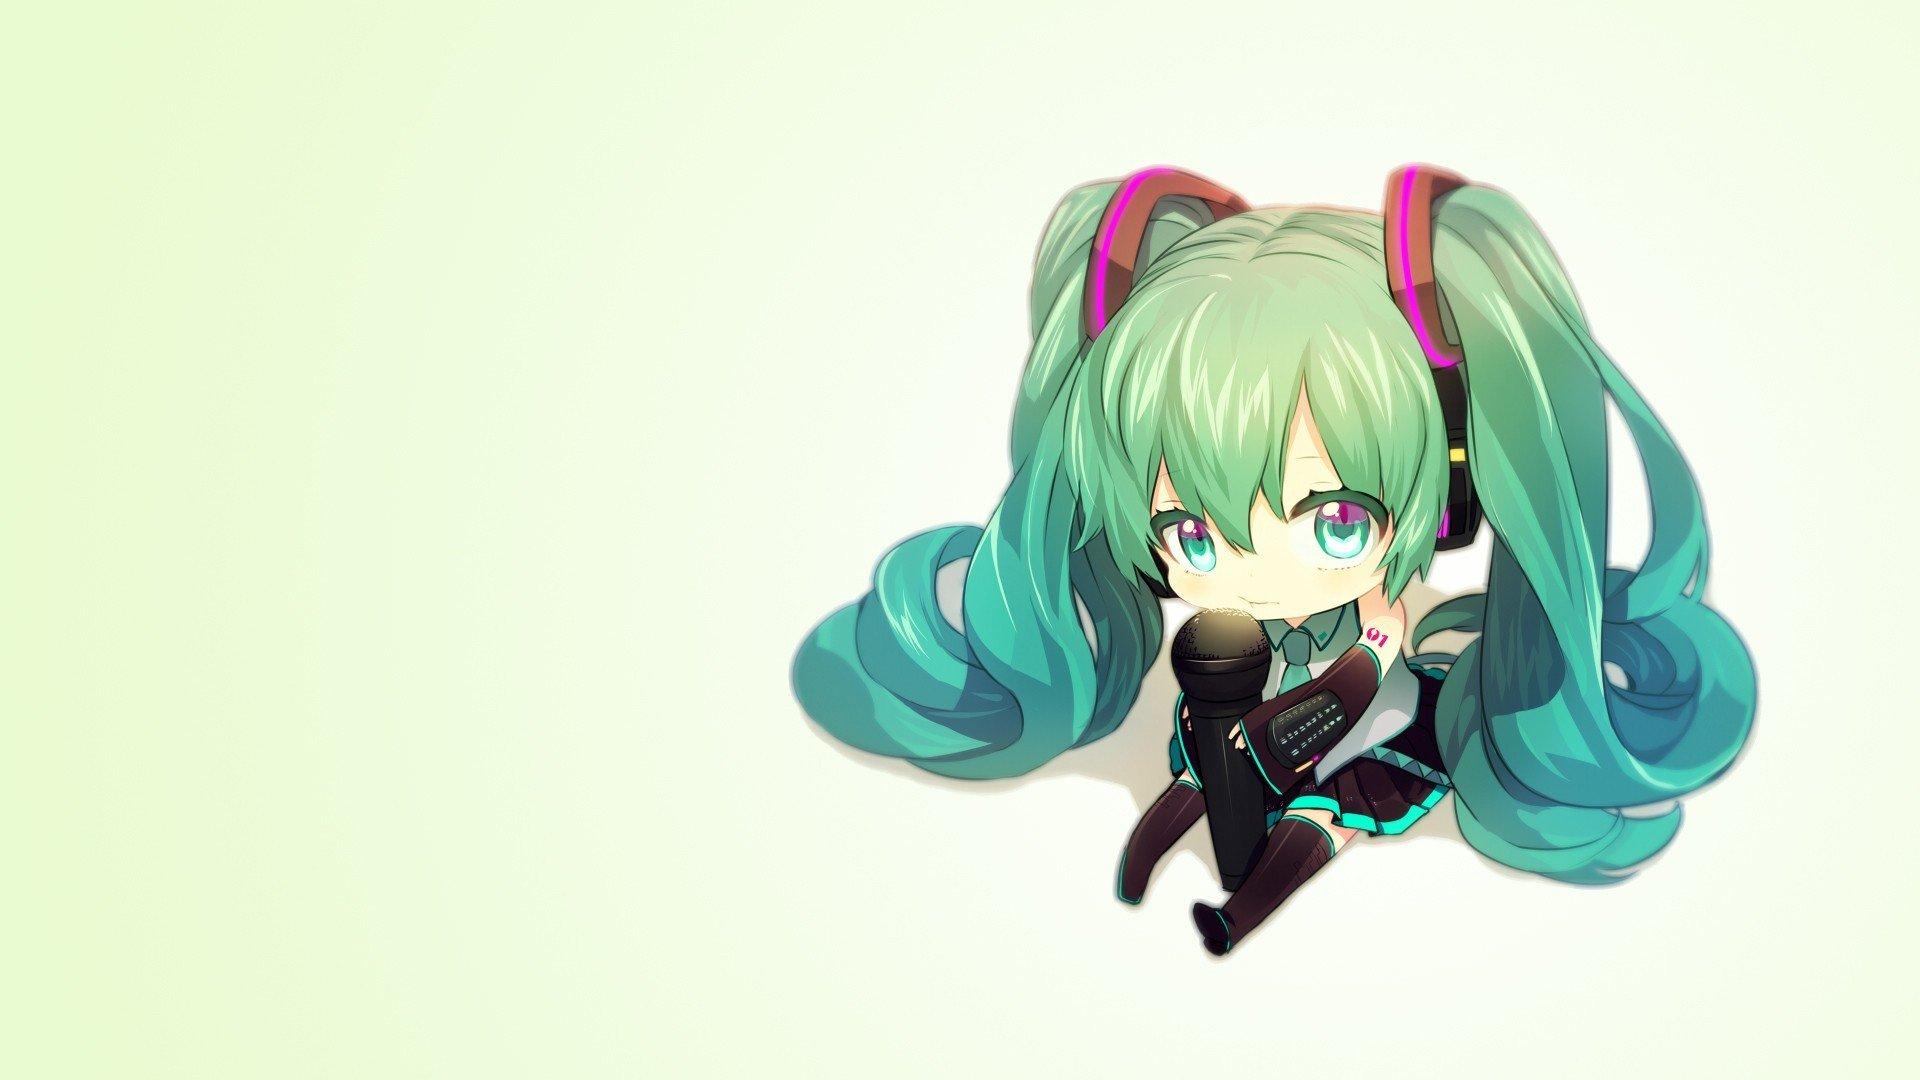 Hatsune miku chibi vocaloid hd wallpapers desktop and mobile images photos - Chibi wallpaper hd ...